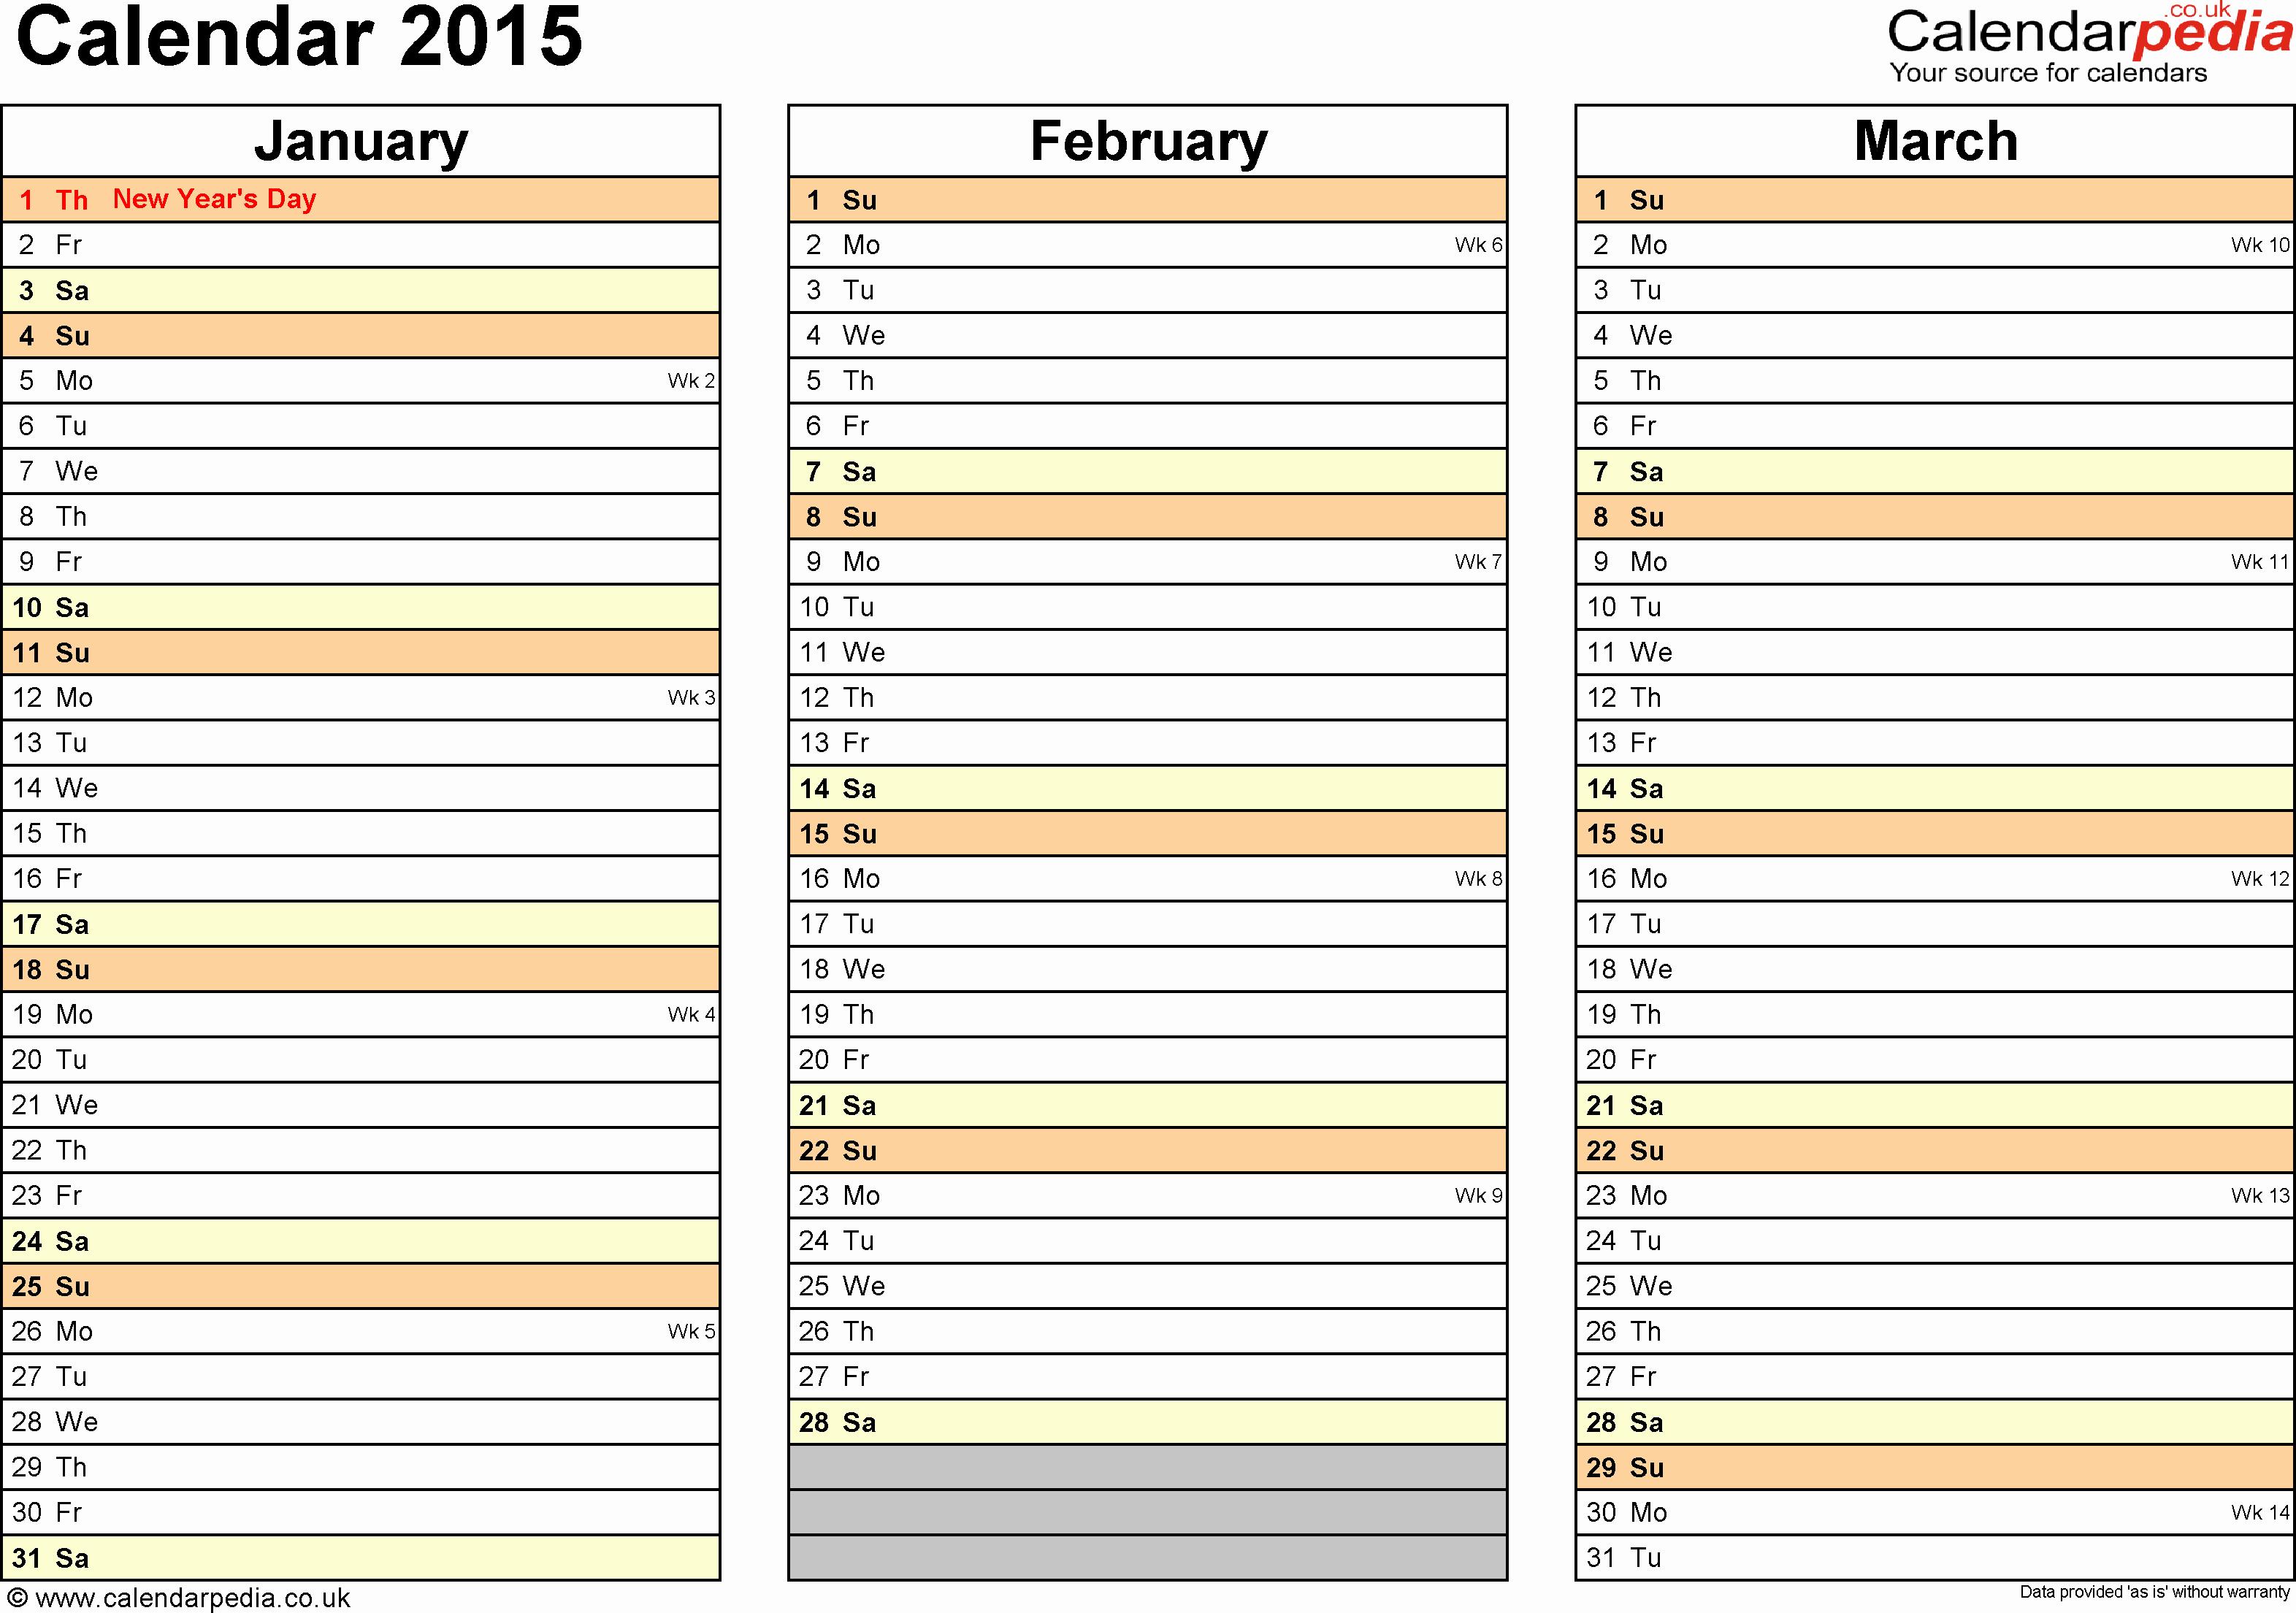 5 Day Calendar Template Word Inspirational Calendar 2015 Uk 16 Free Printable Word Templates